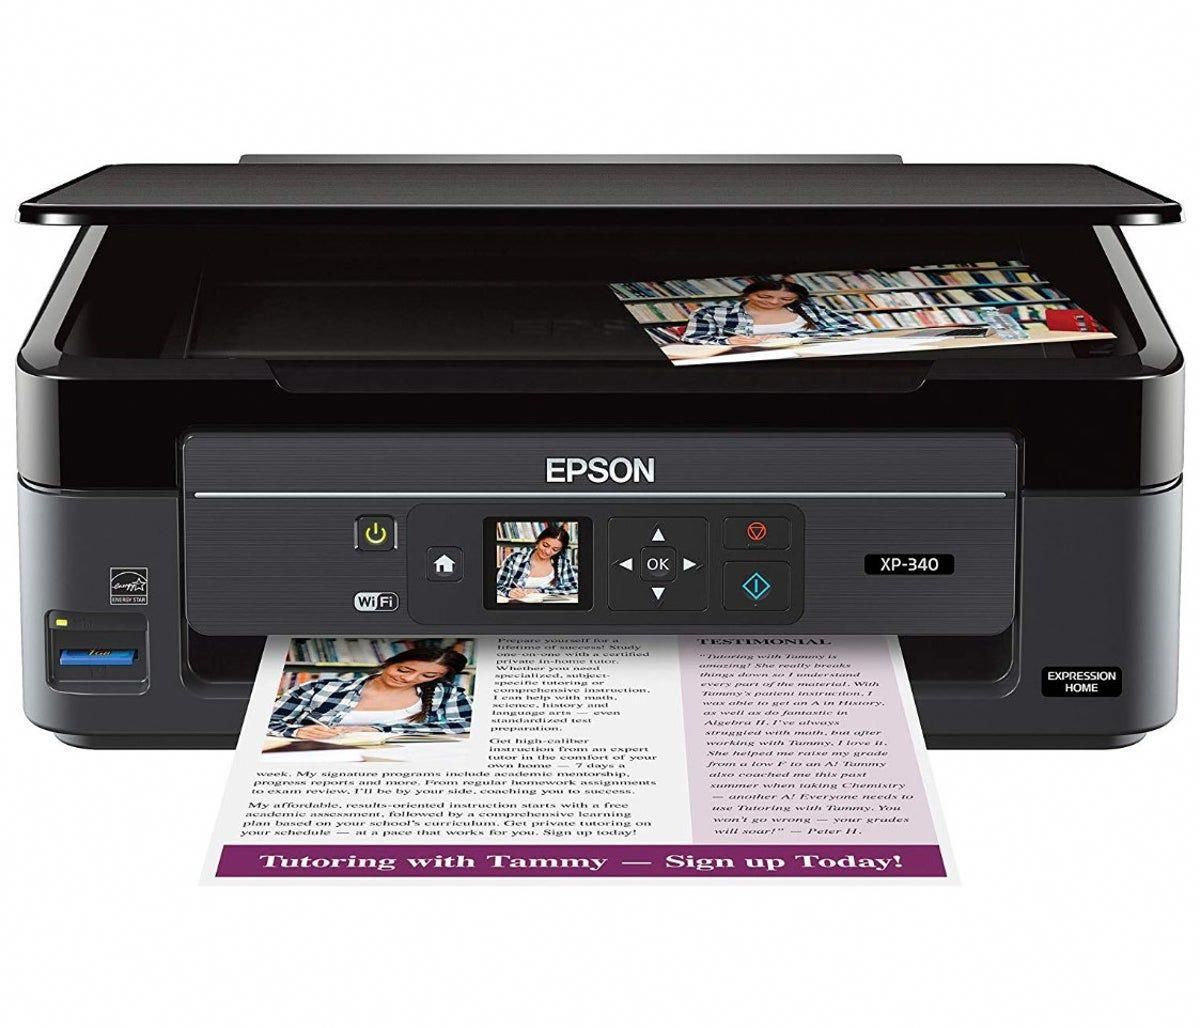 Photo Scanners Mac Wireless Printer Printer Scanner Epson